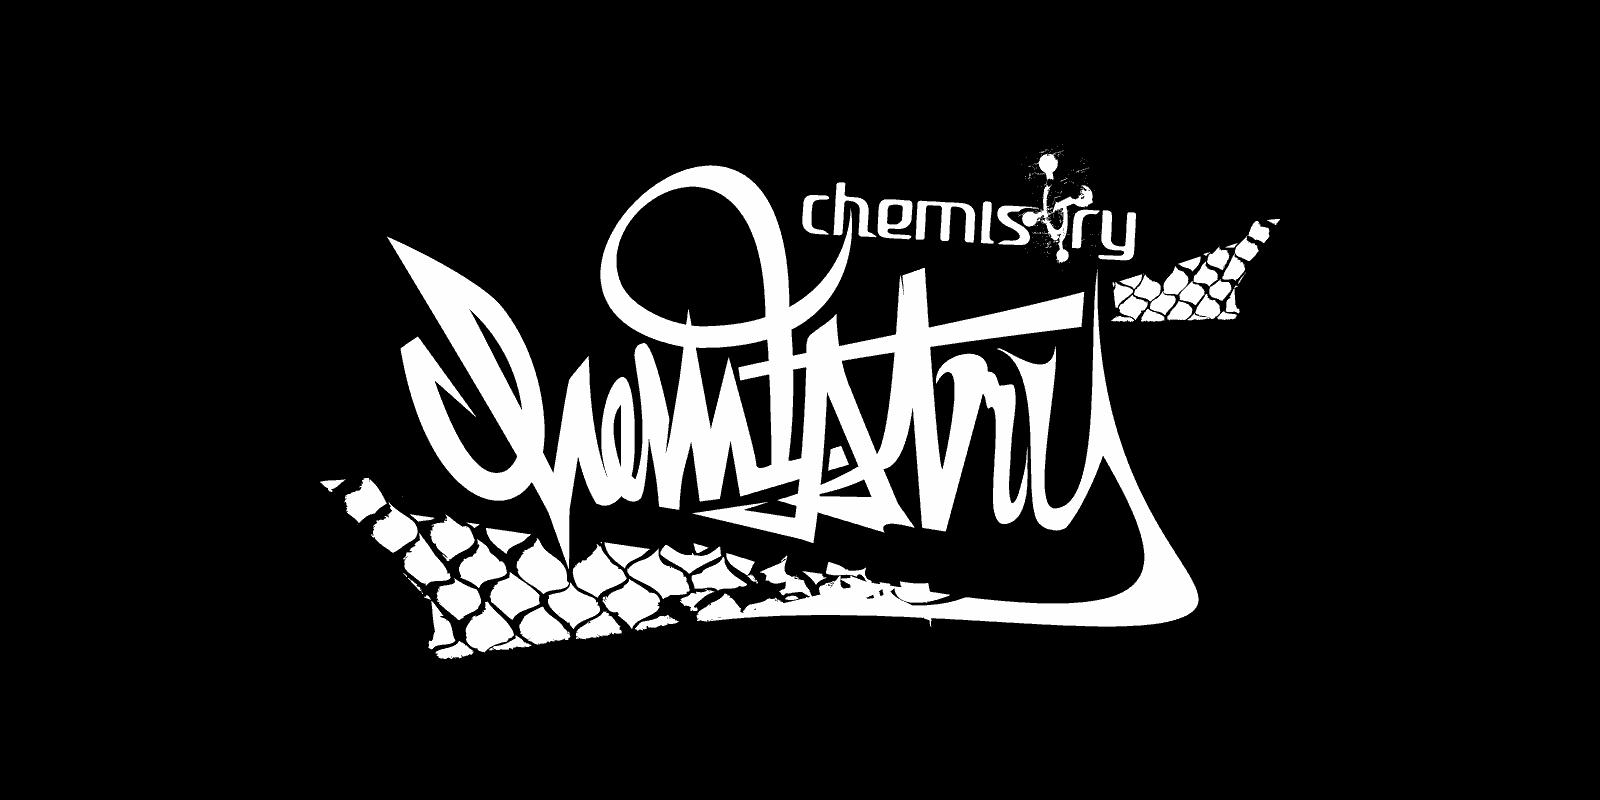 Chemistry Net